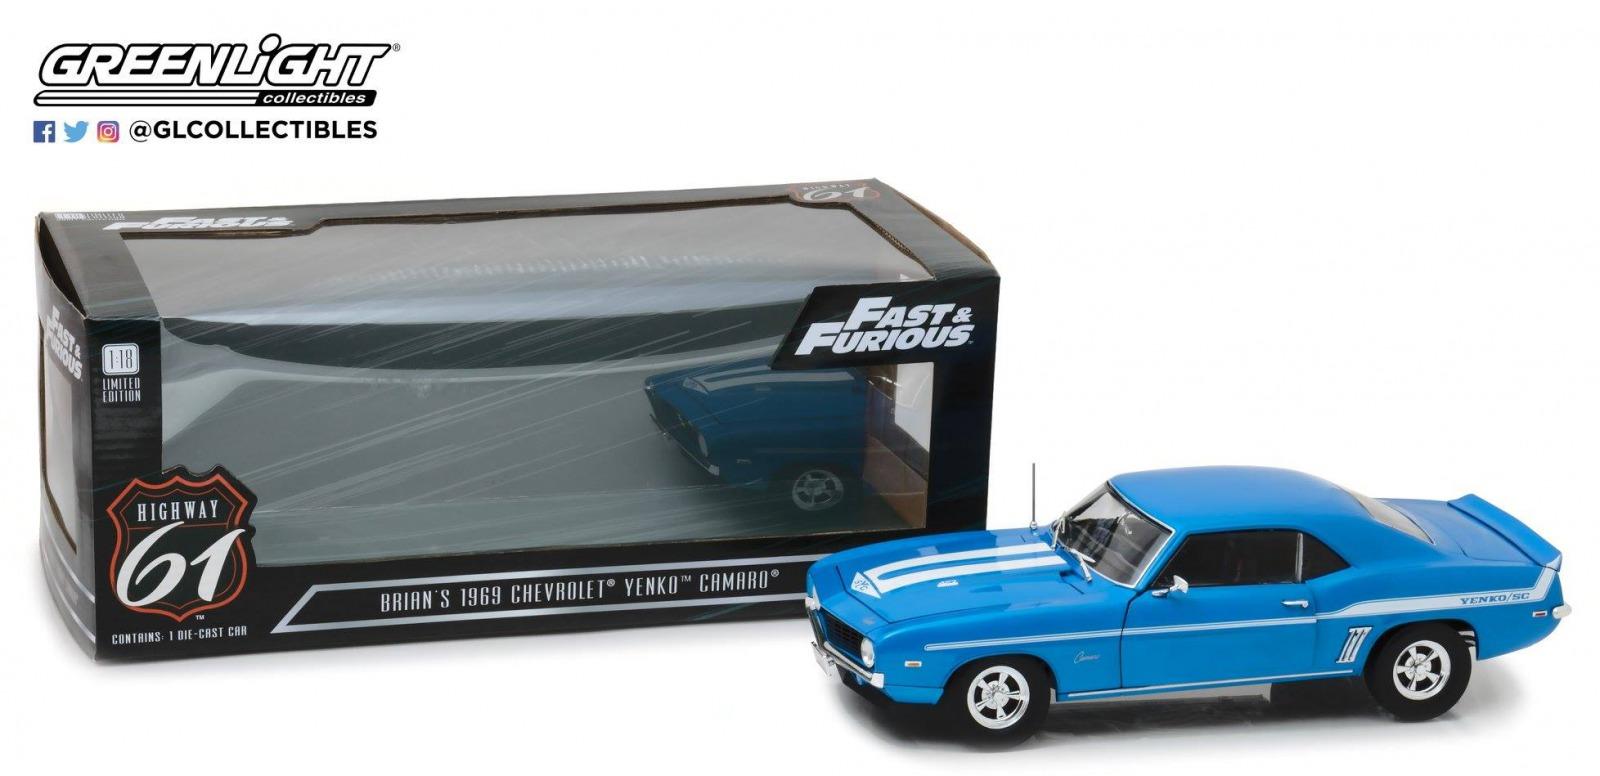 "Highway 61 1:18電影""粗礦速度X2""1969年moderushiborekamaro Yenko 427藍色1969 Chevrolet Yenko 427 Camaro 2Fast 2Furious blue with white stripes 1/18 by Highway 61"